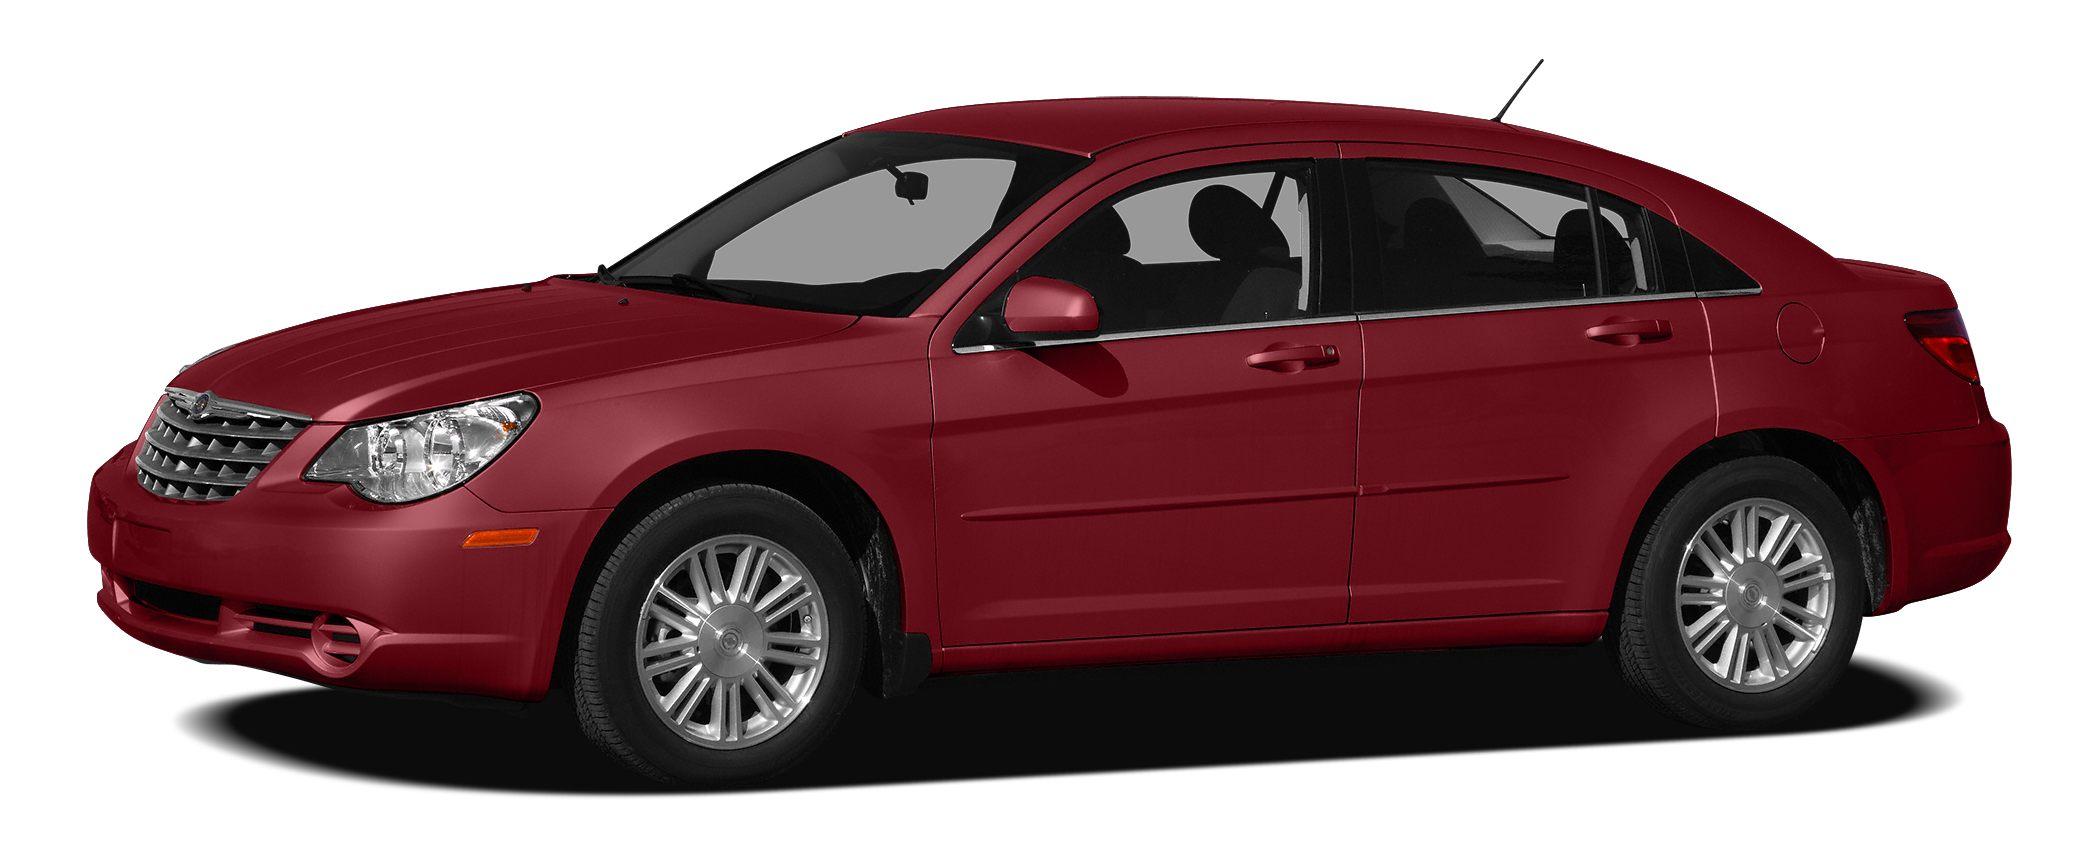 2010 Chrysler Sebring Touring Touring trim 12000 MIle Warranty LOW MILES - 33833 FUEL EFFICIE